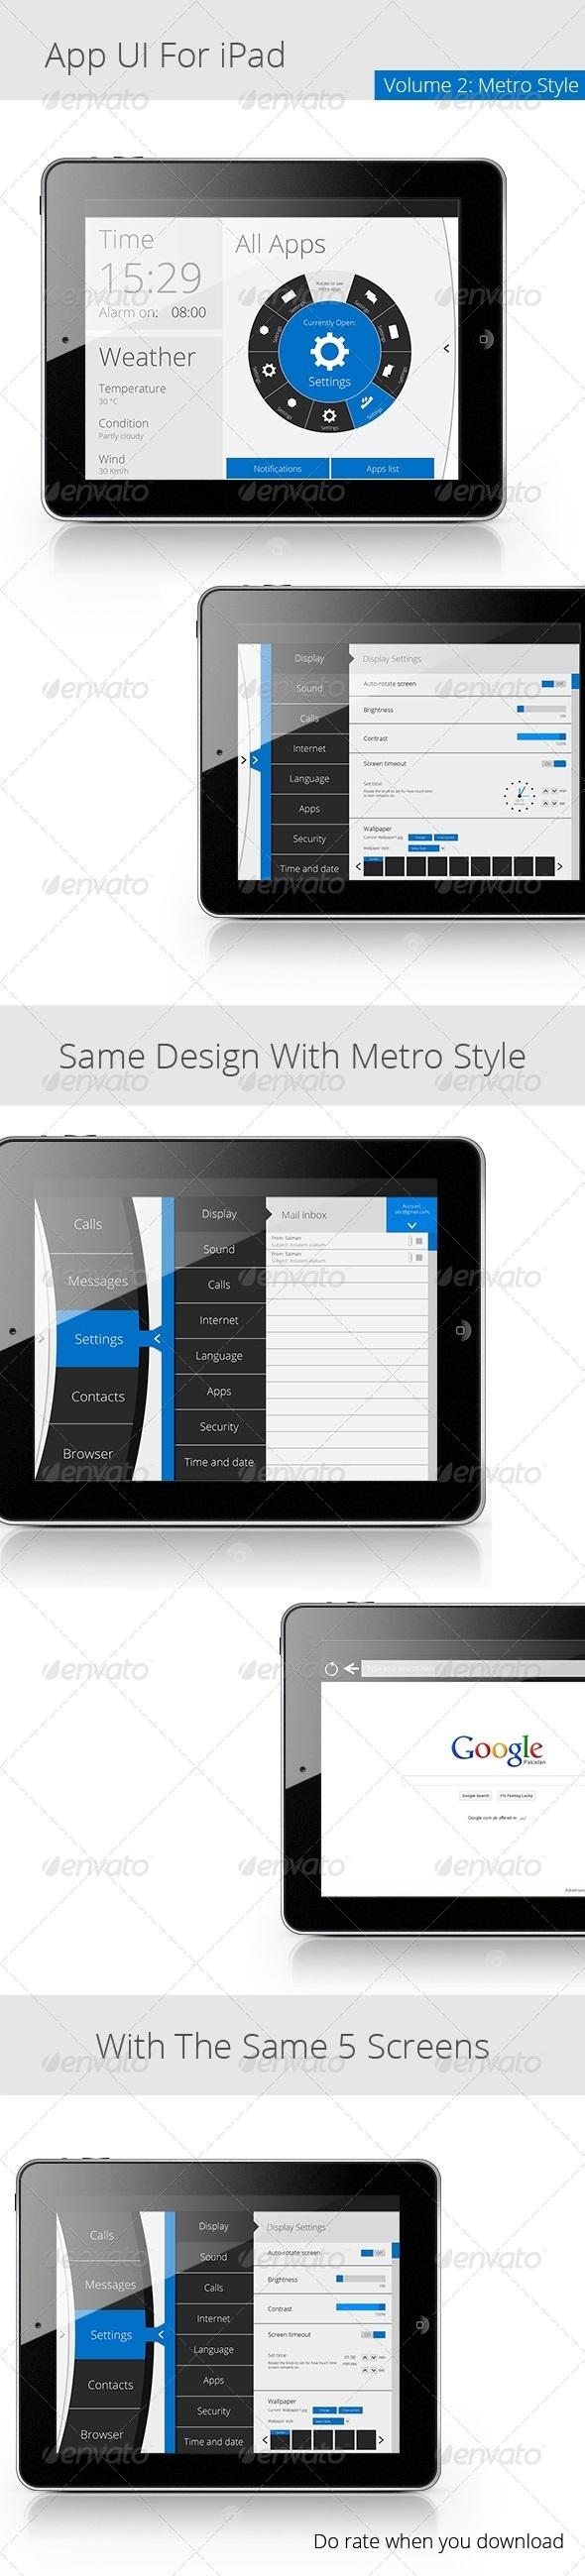 GraphicRiver App UI For iPad Volume 2 4887251